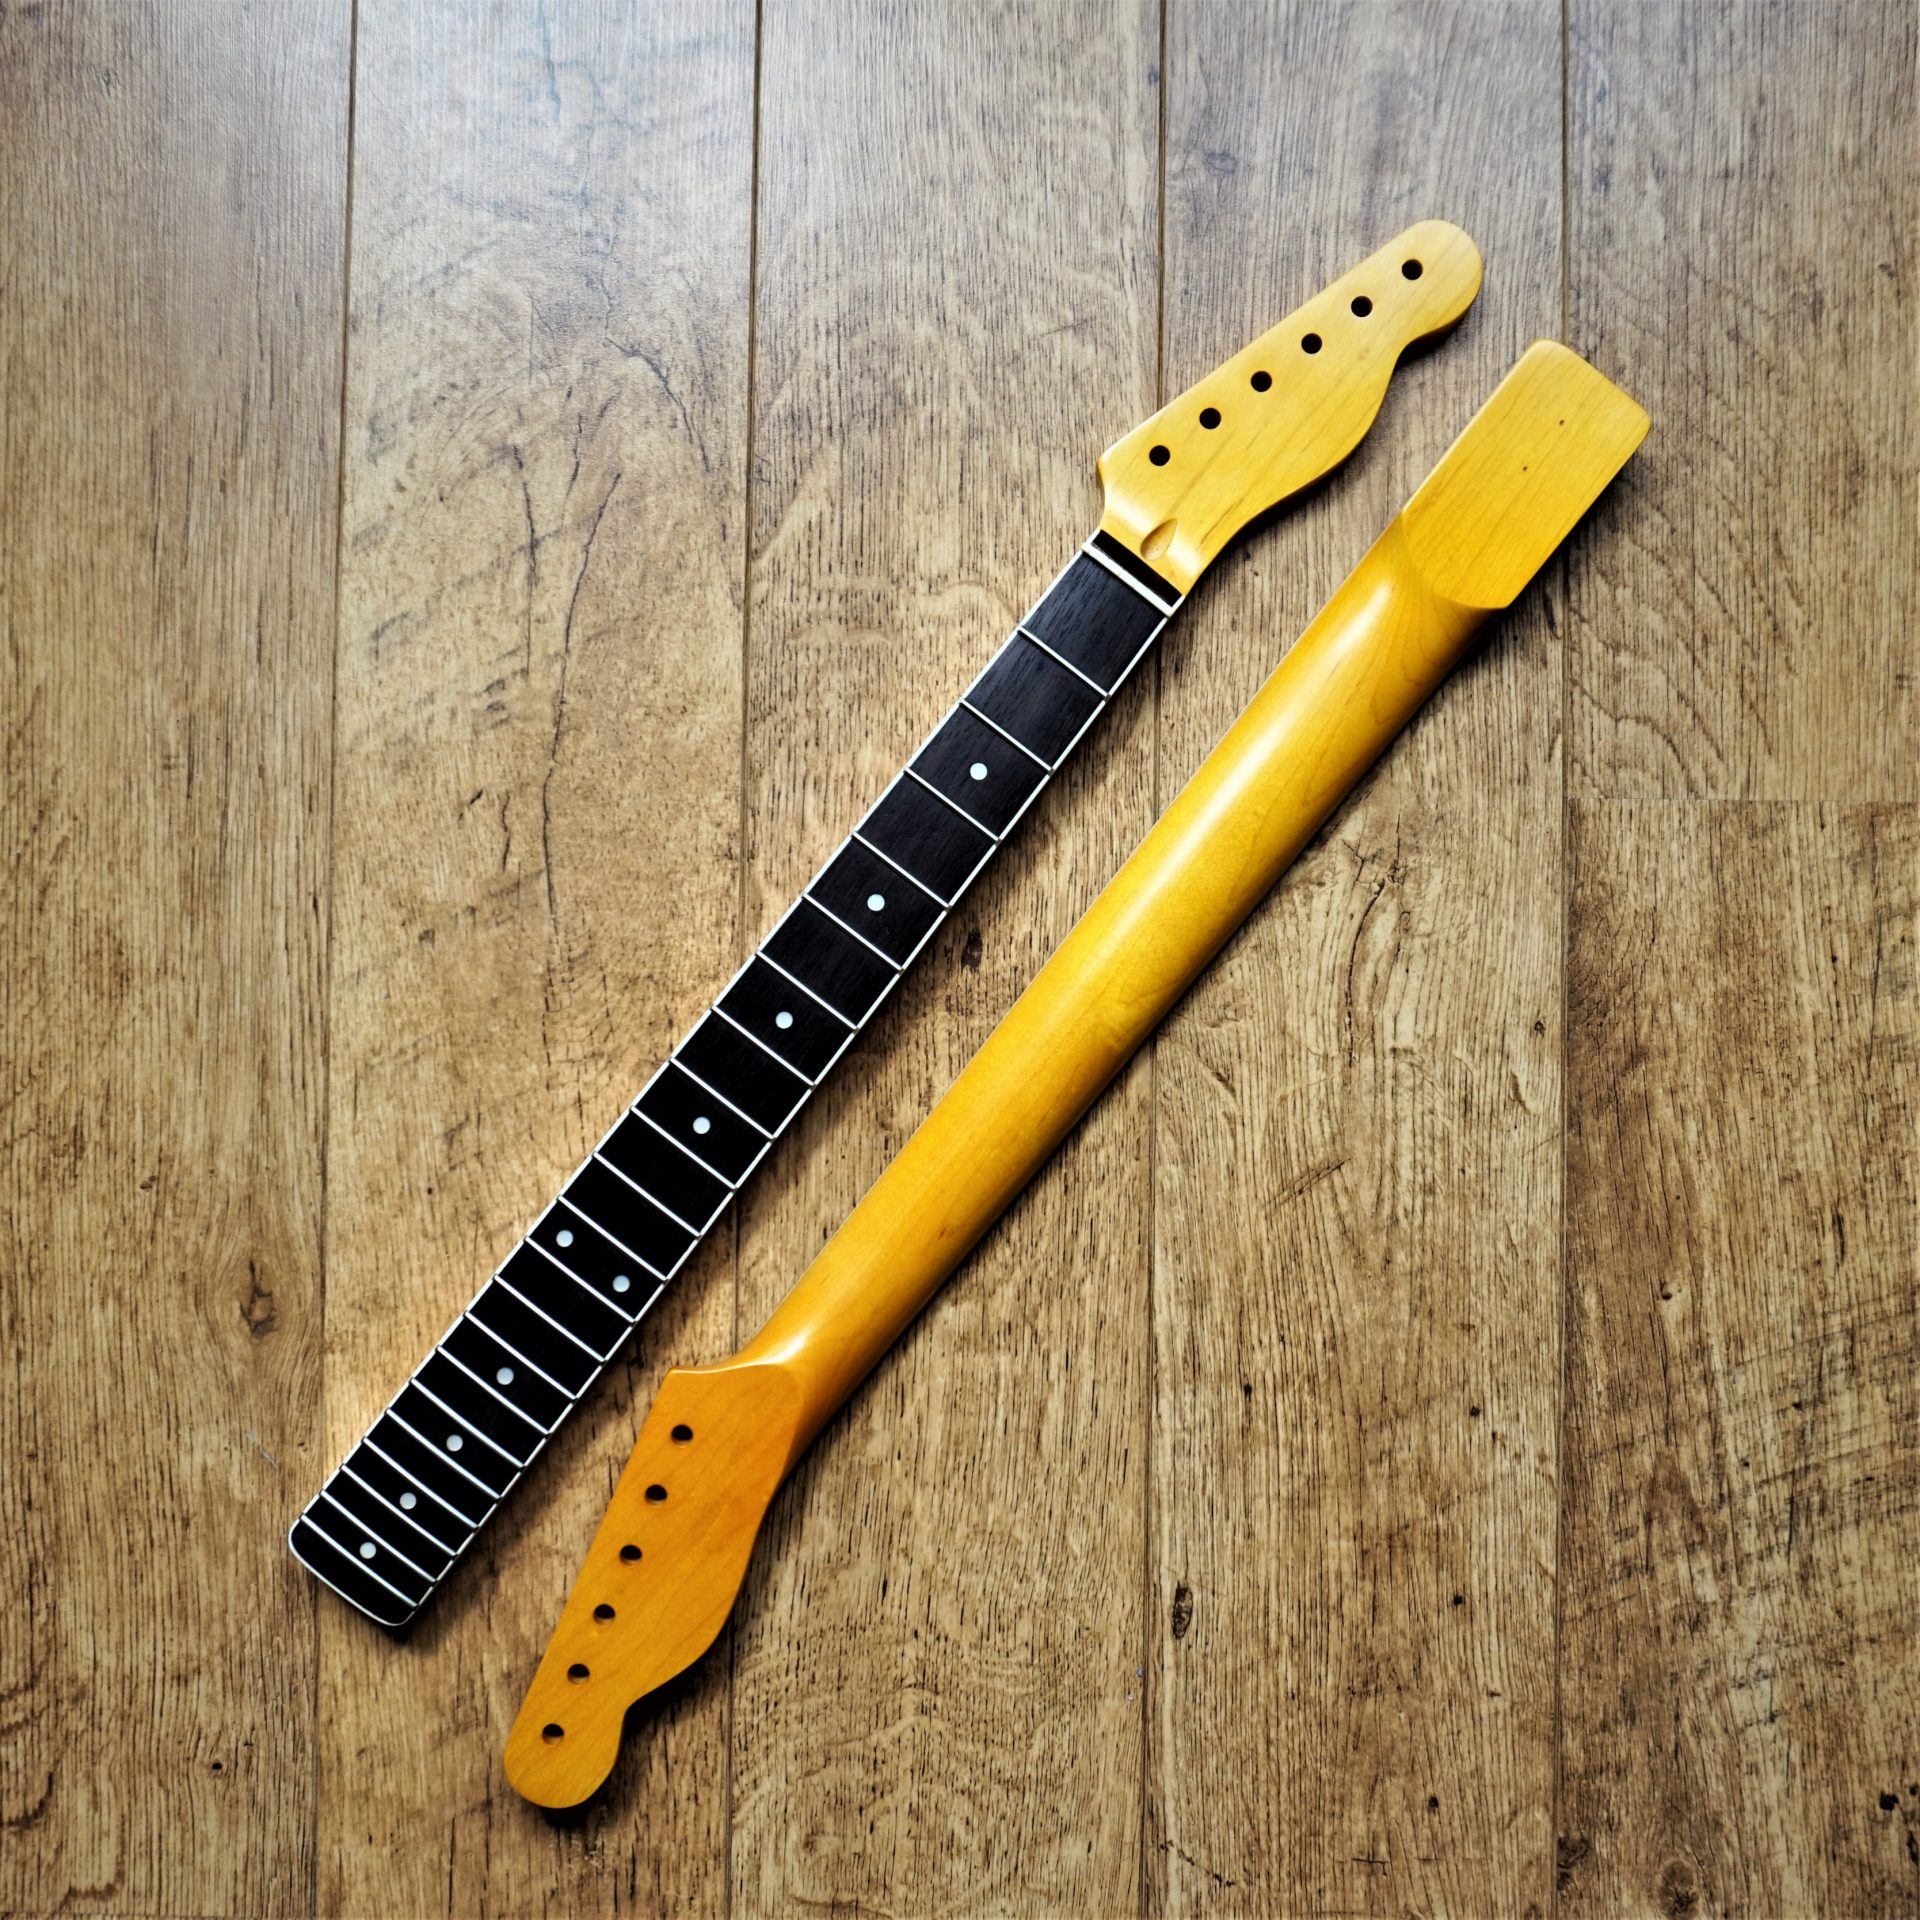 Bound Telecaster Guitar Neck 22 Fret Jumbo | Guitar Anatomy